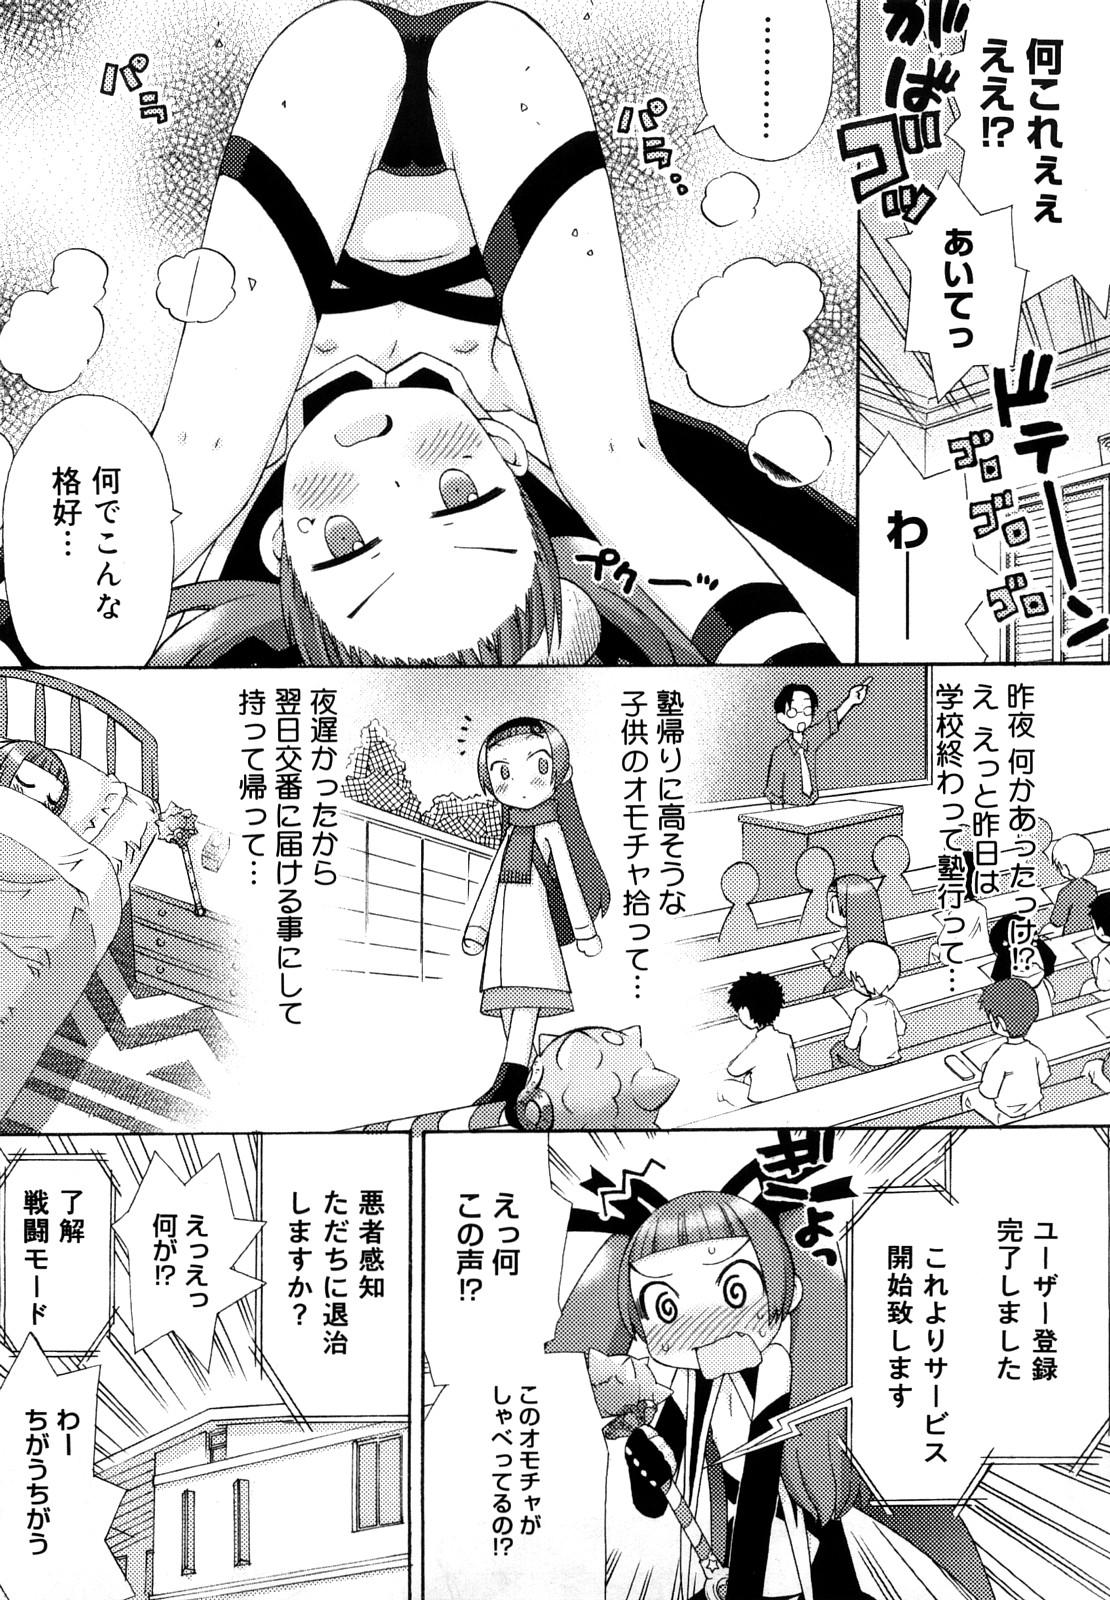 Hatsuden Pandakun! Shinsouban 111